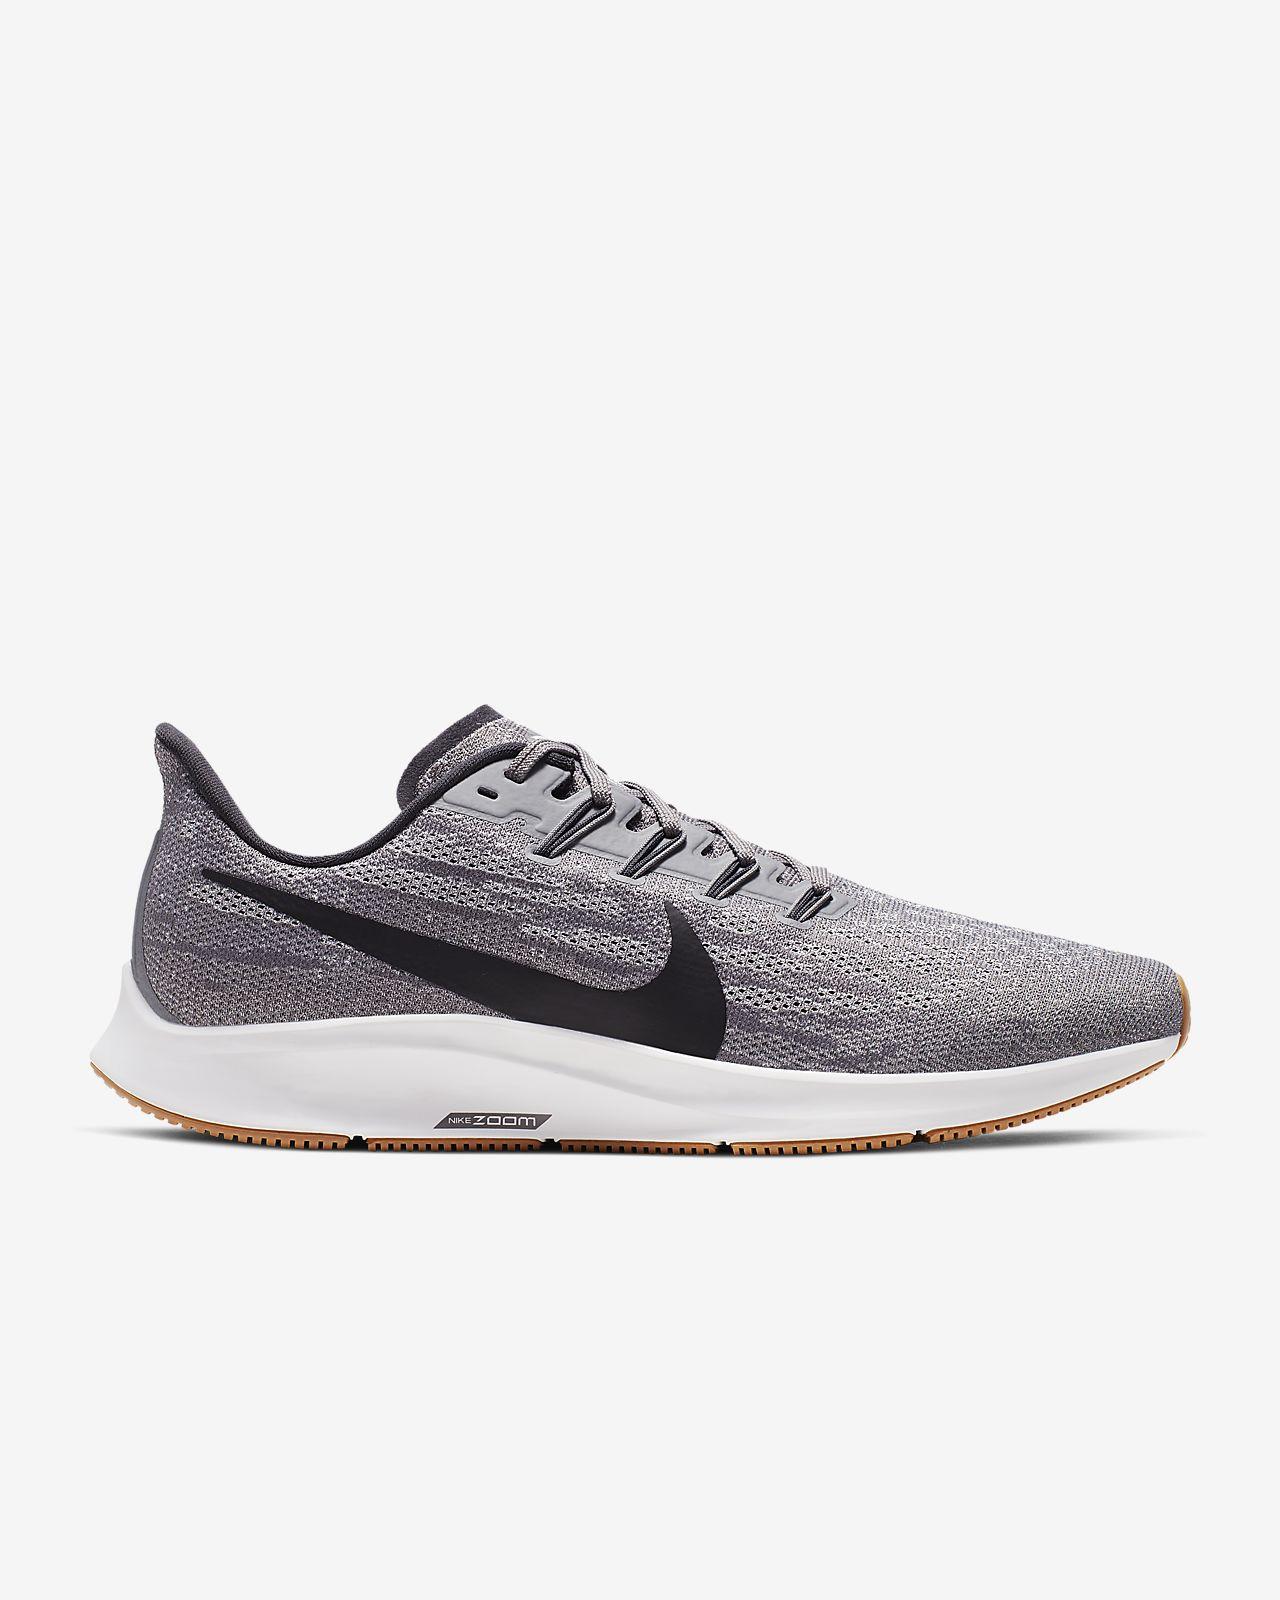 hot sale online c79ab 69656 Nike Air Zoom Pegasus 36 Men's Running Shoe